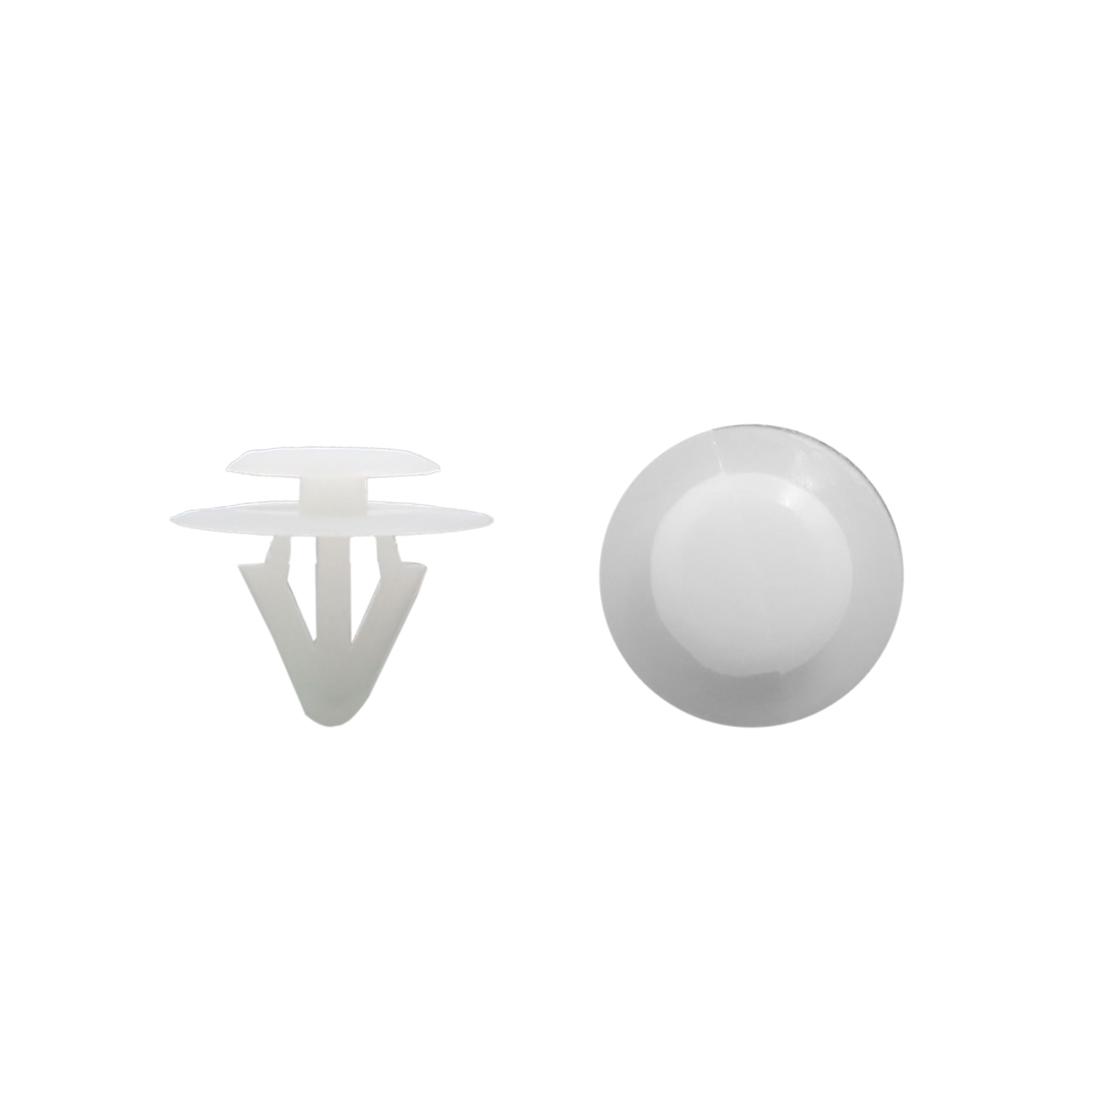 100pcs White Plastic Rivets Clips Push Type Bumper Retainer for Vehicle Car